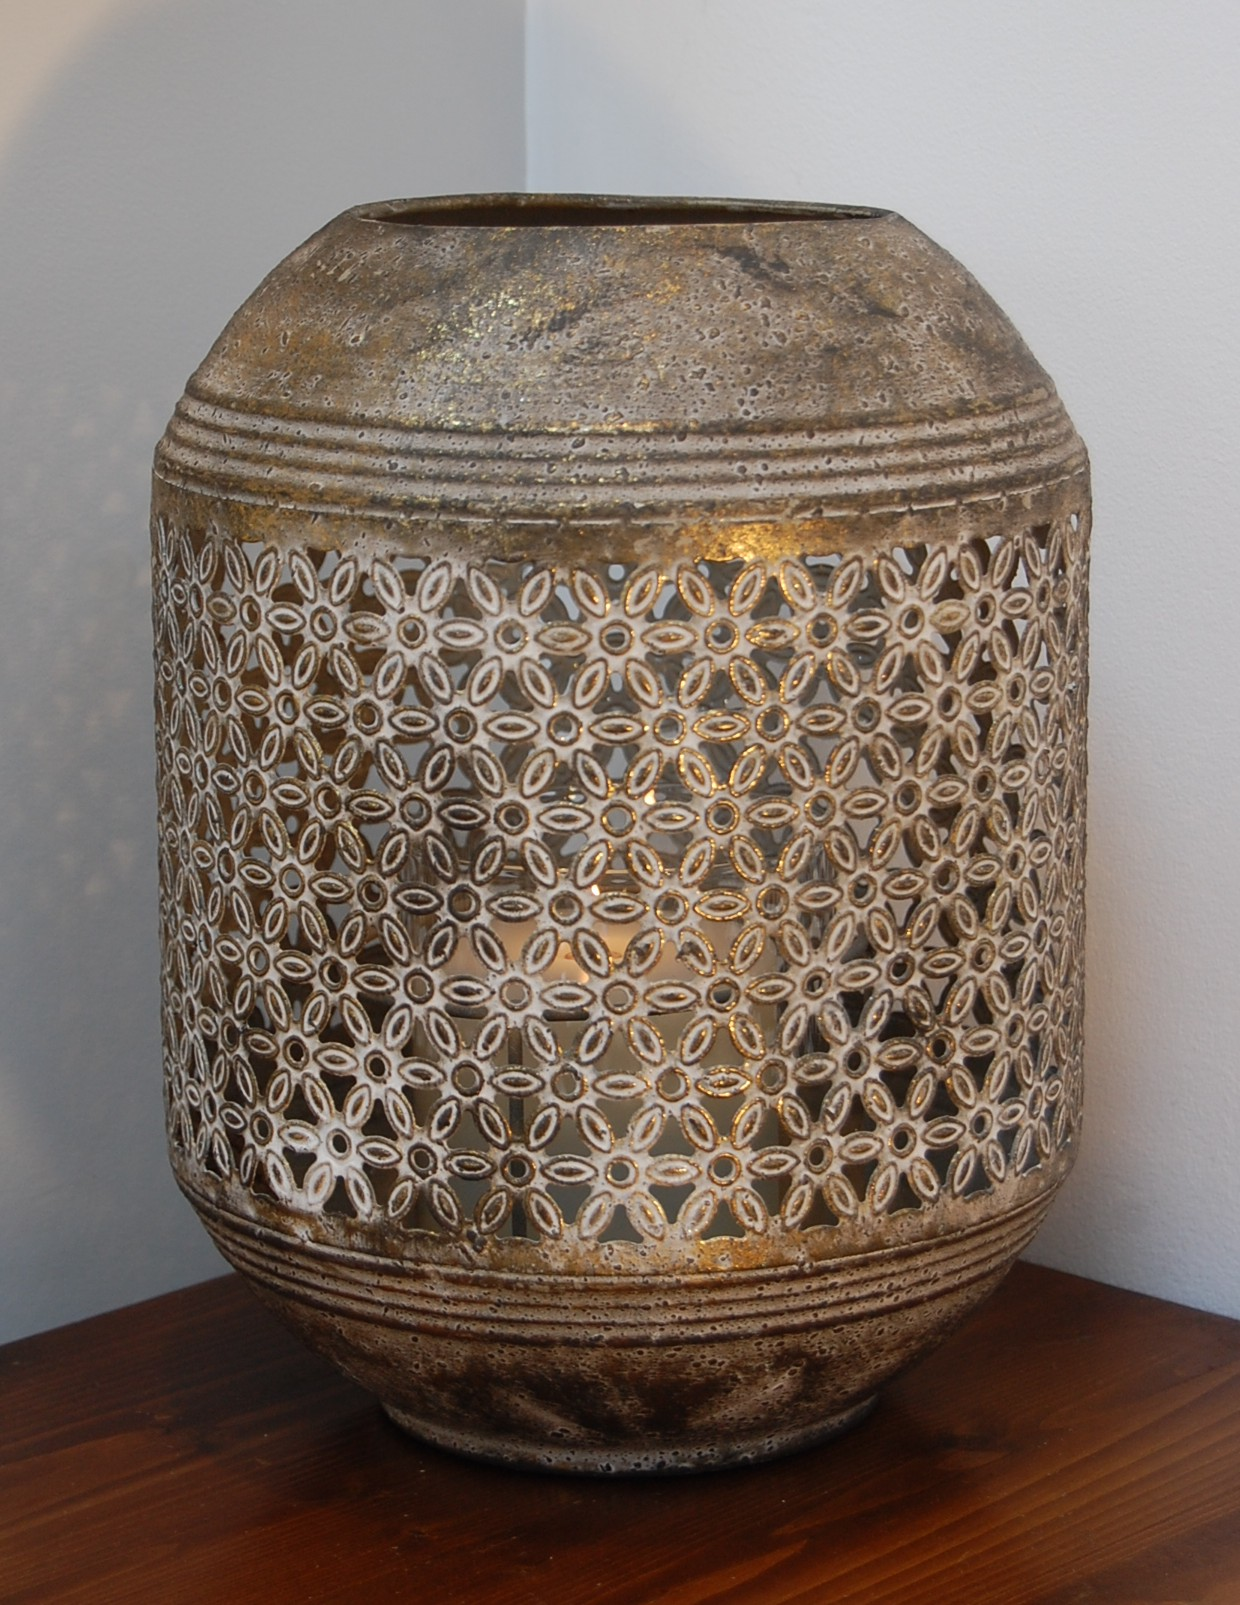 Moghul Drum Lantern Small Drum Shaped Lantern